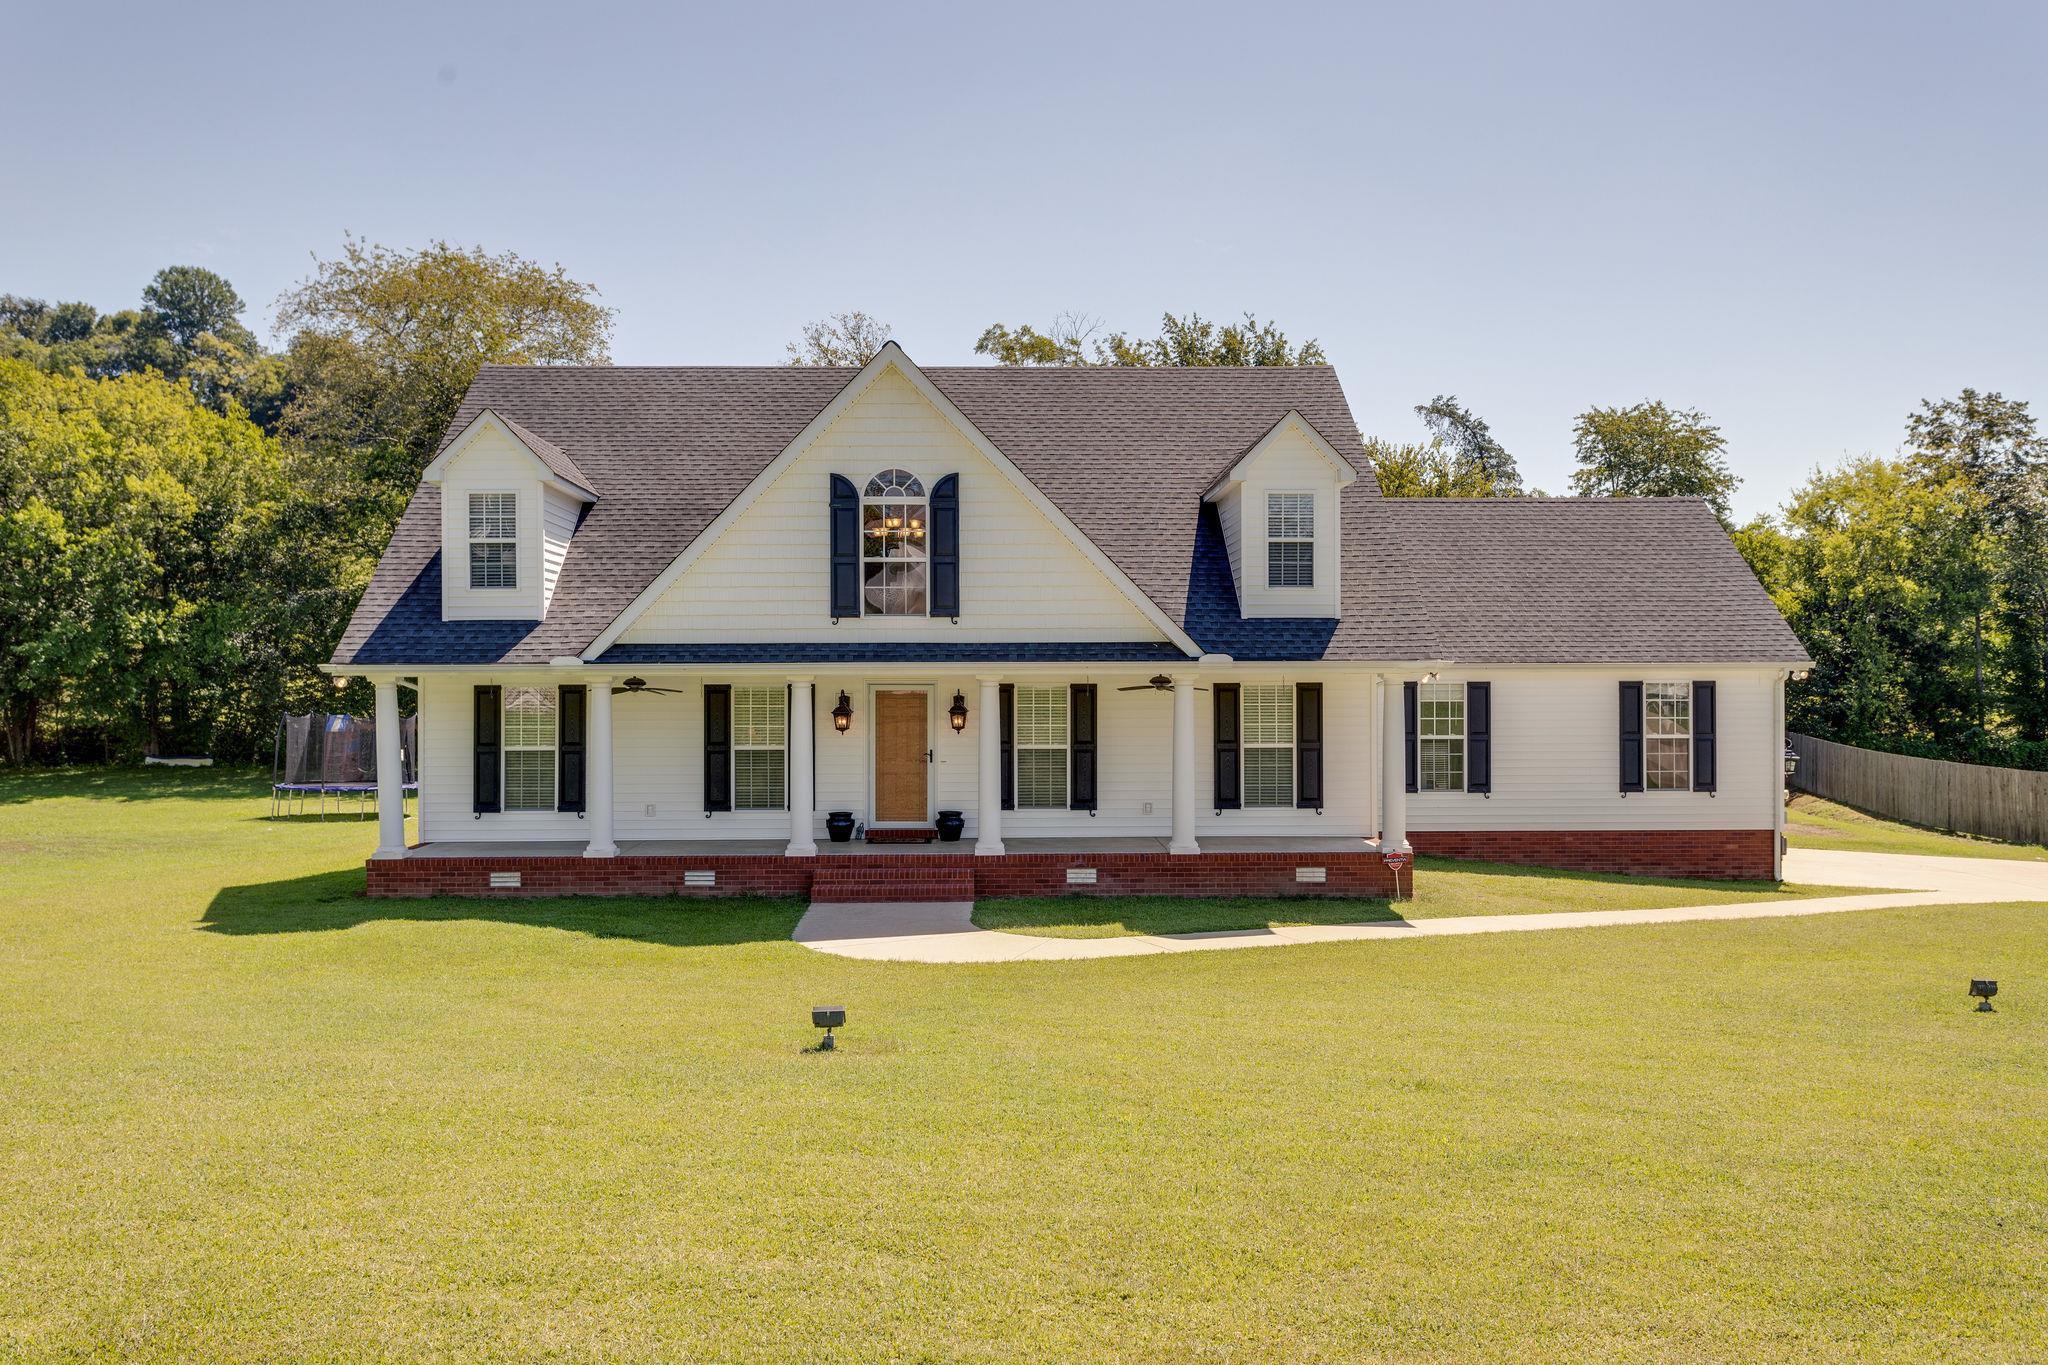 400 Williamsburg Dr, Pulaski, TN 38478 - Pulaski, TN real estate listing